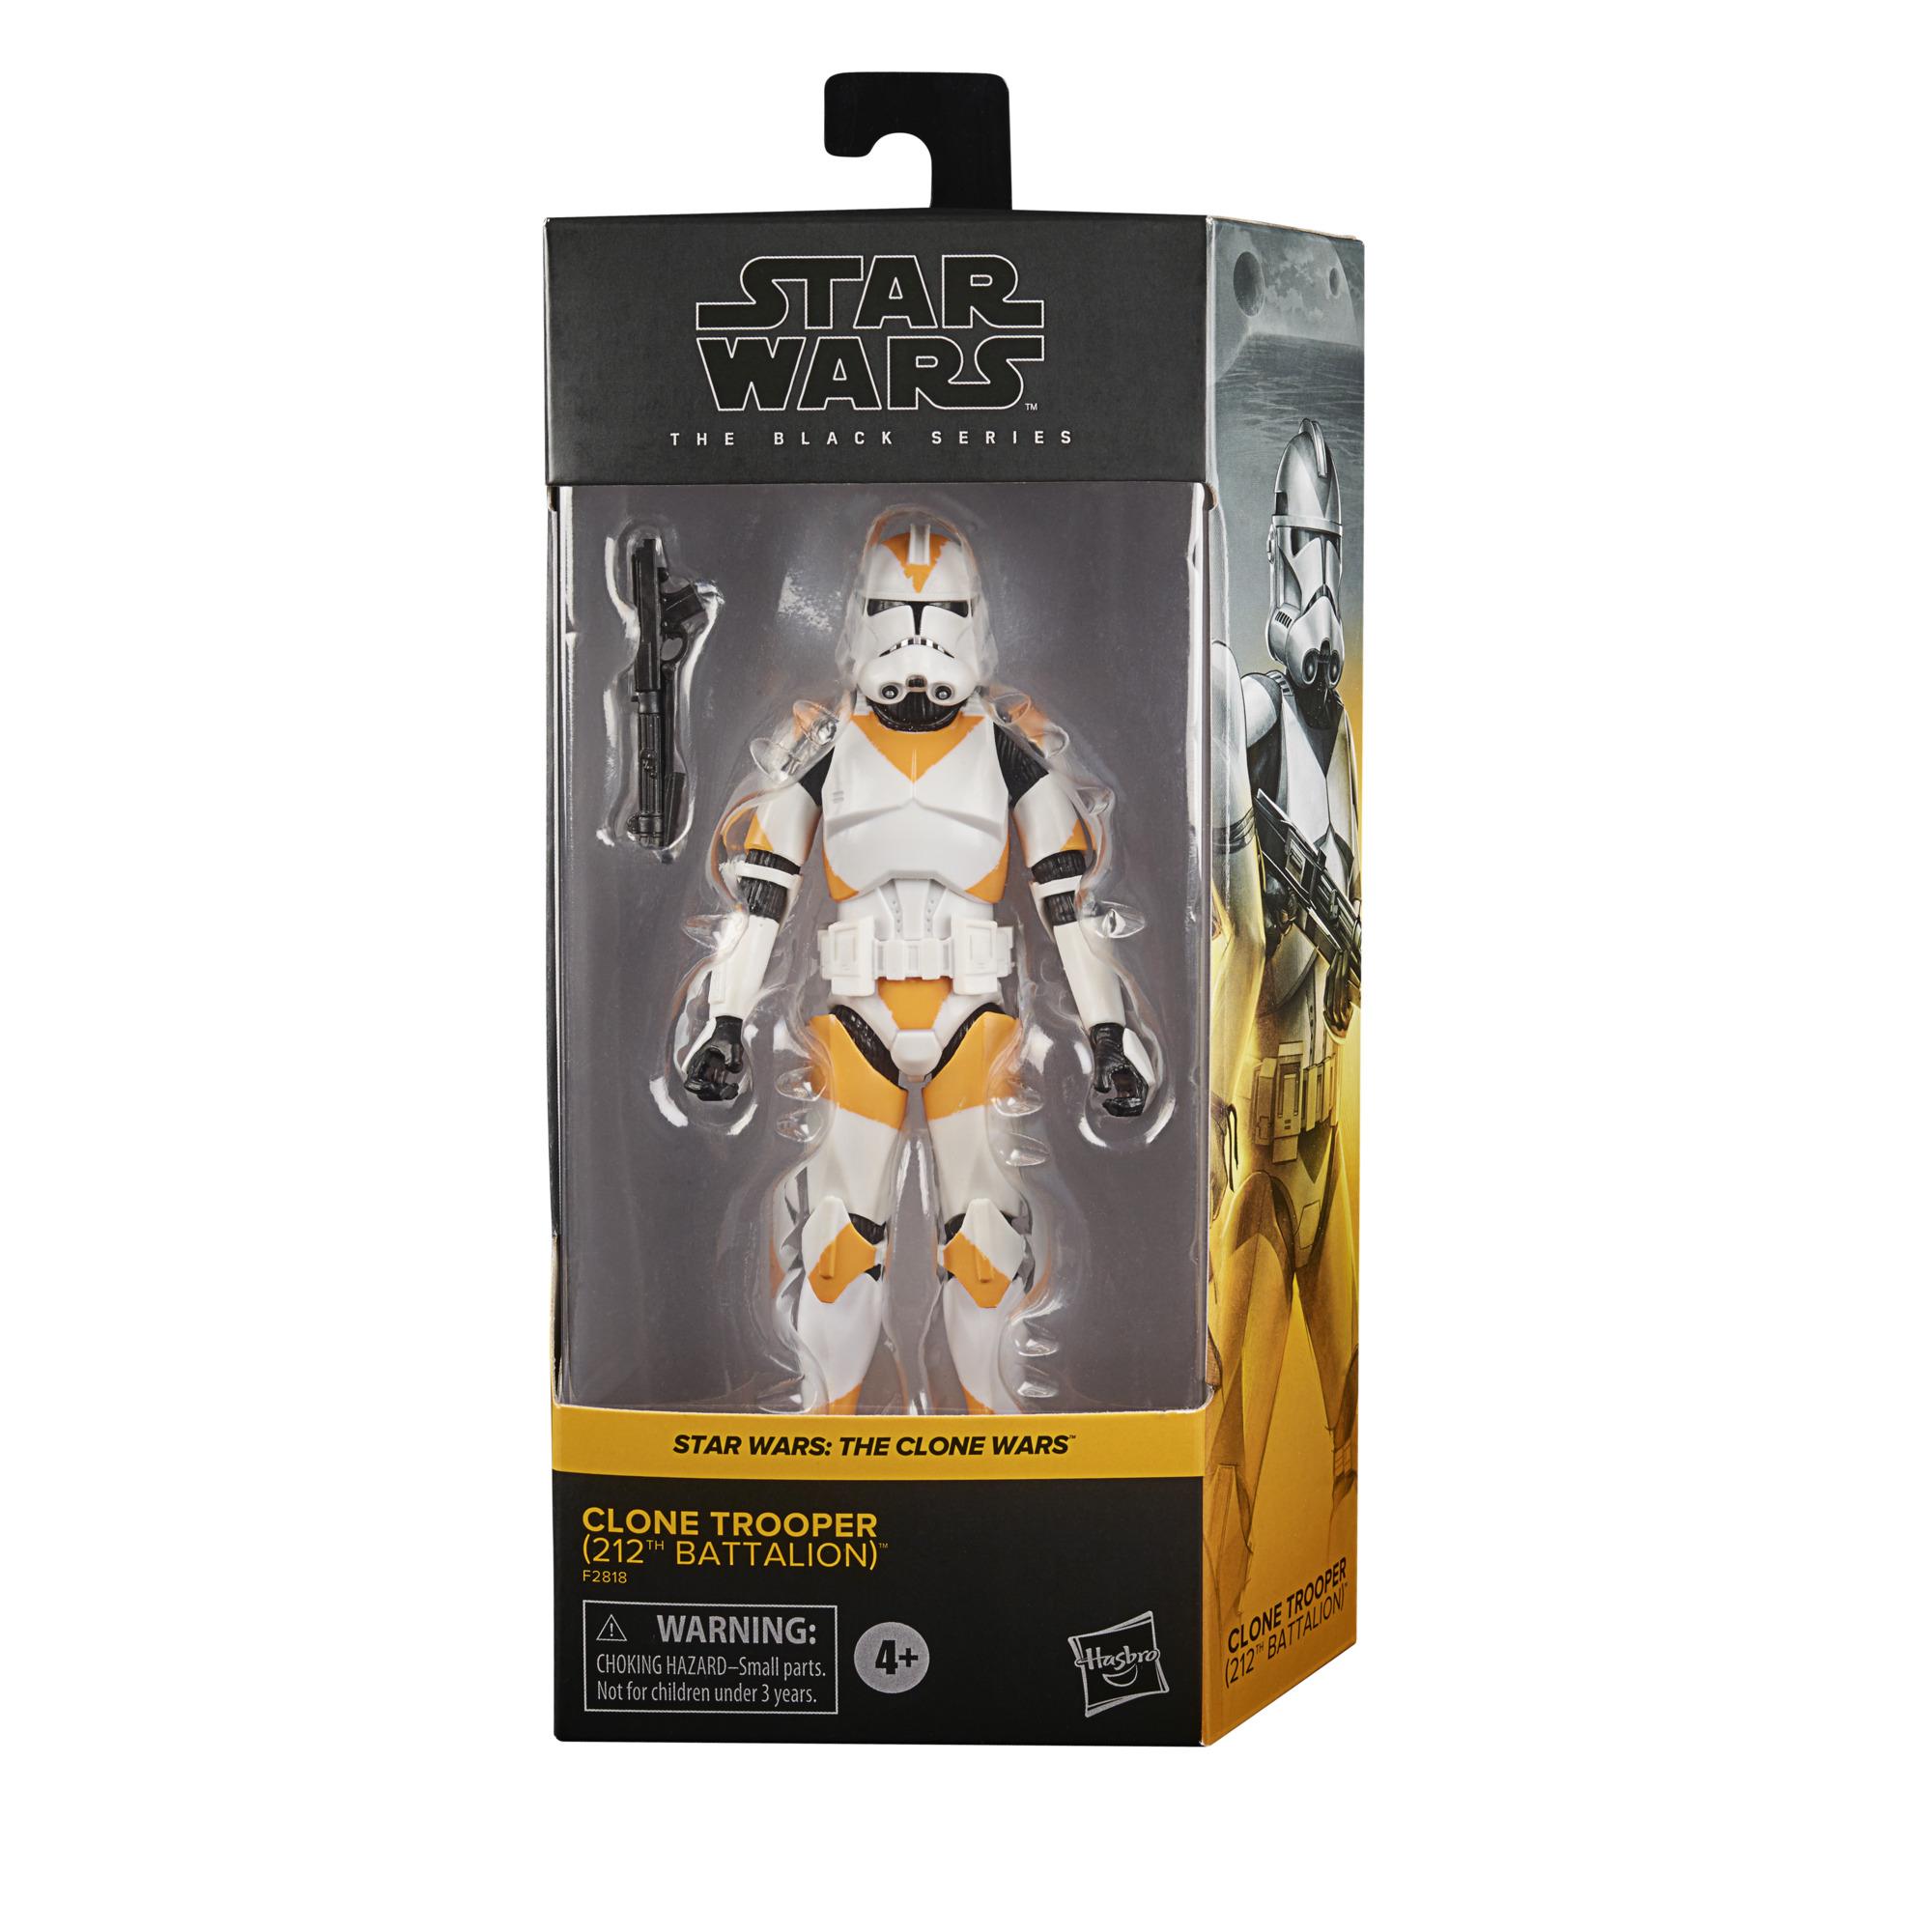 Star Wars The Black Series Clone Trooper (212 th Battalion) 6-Inch Action Figure画像